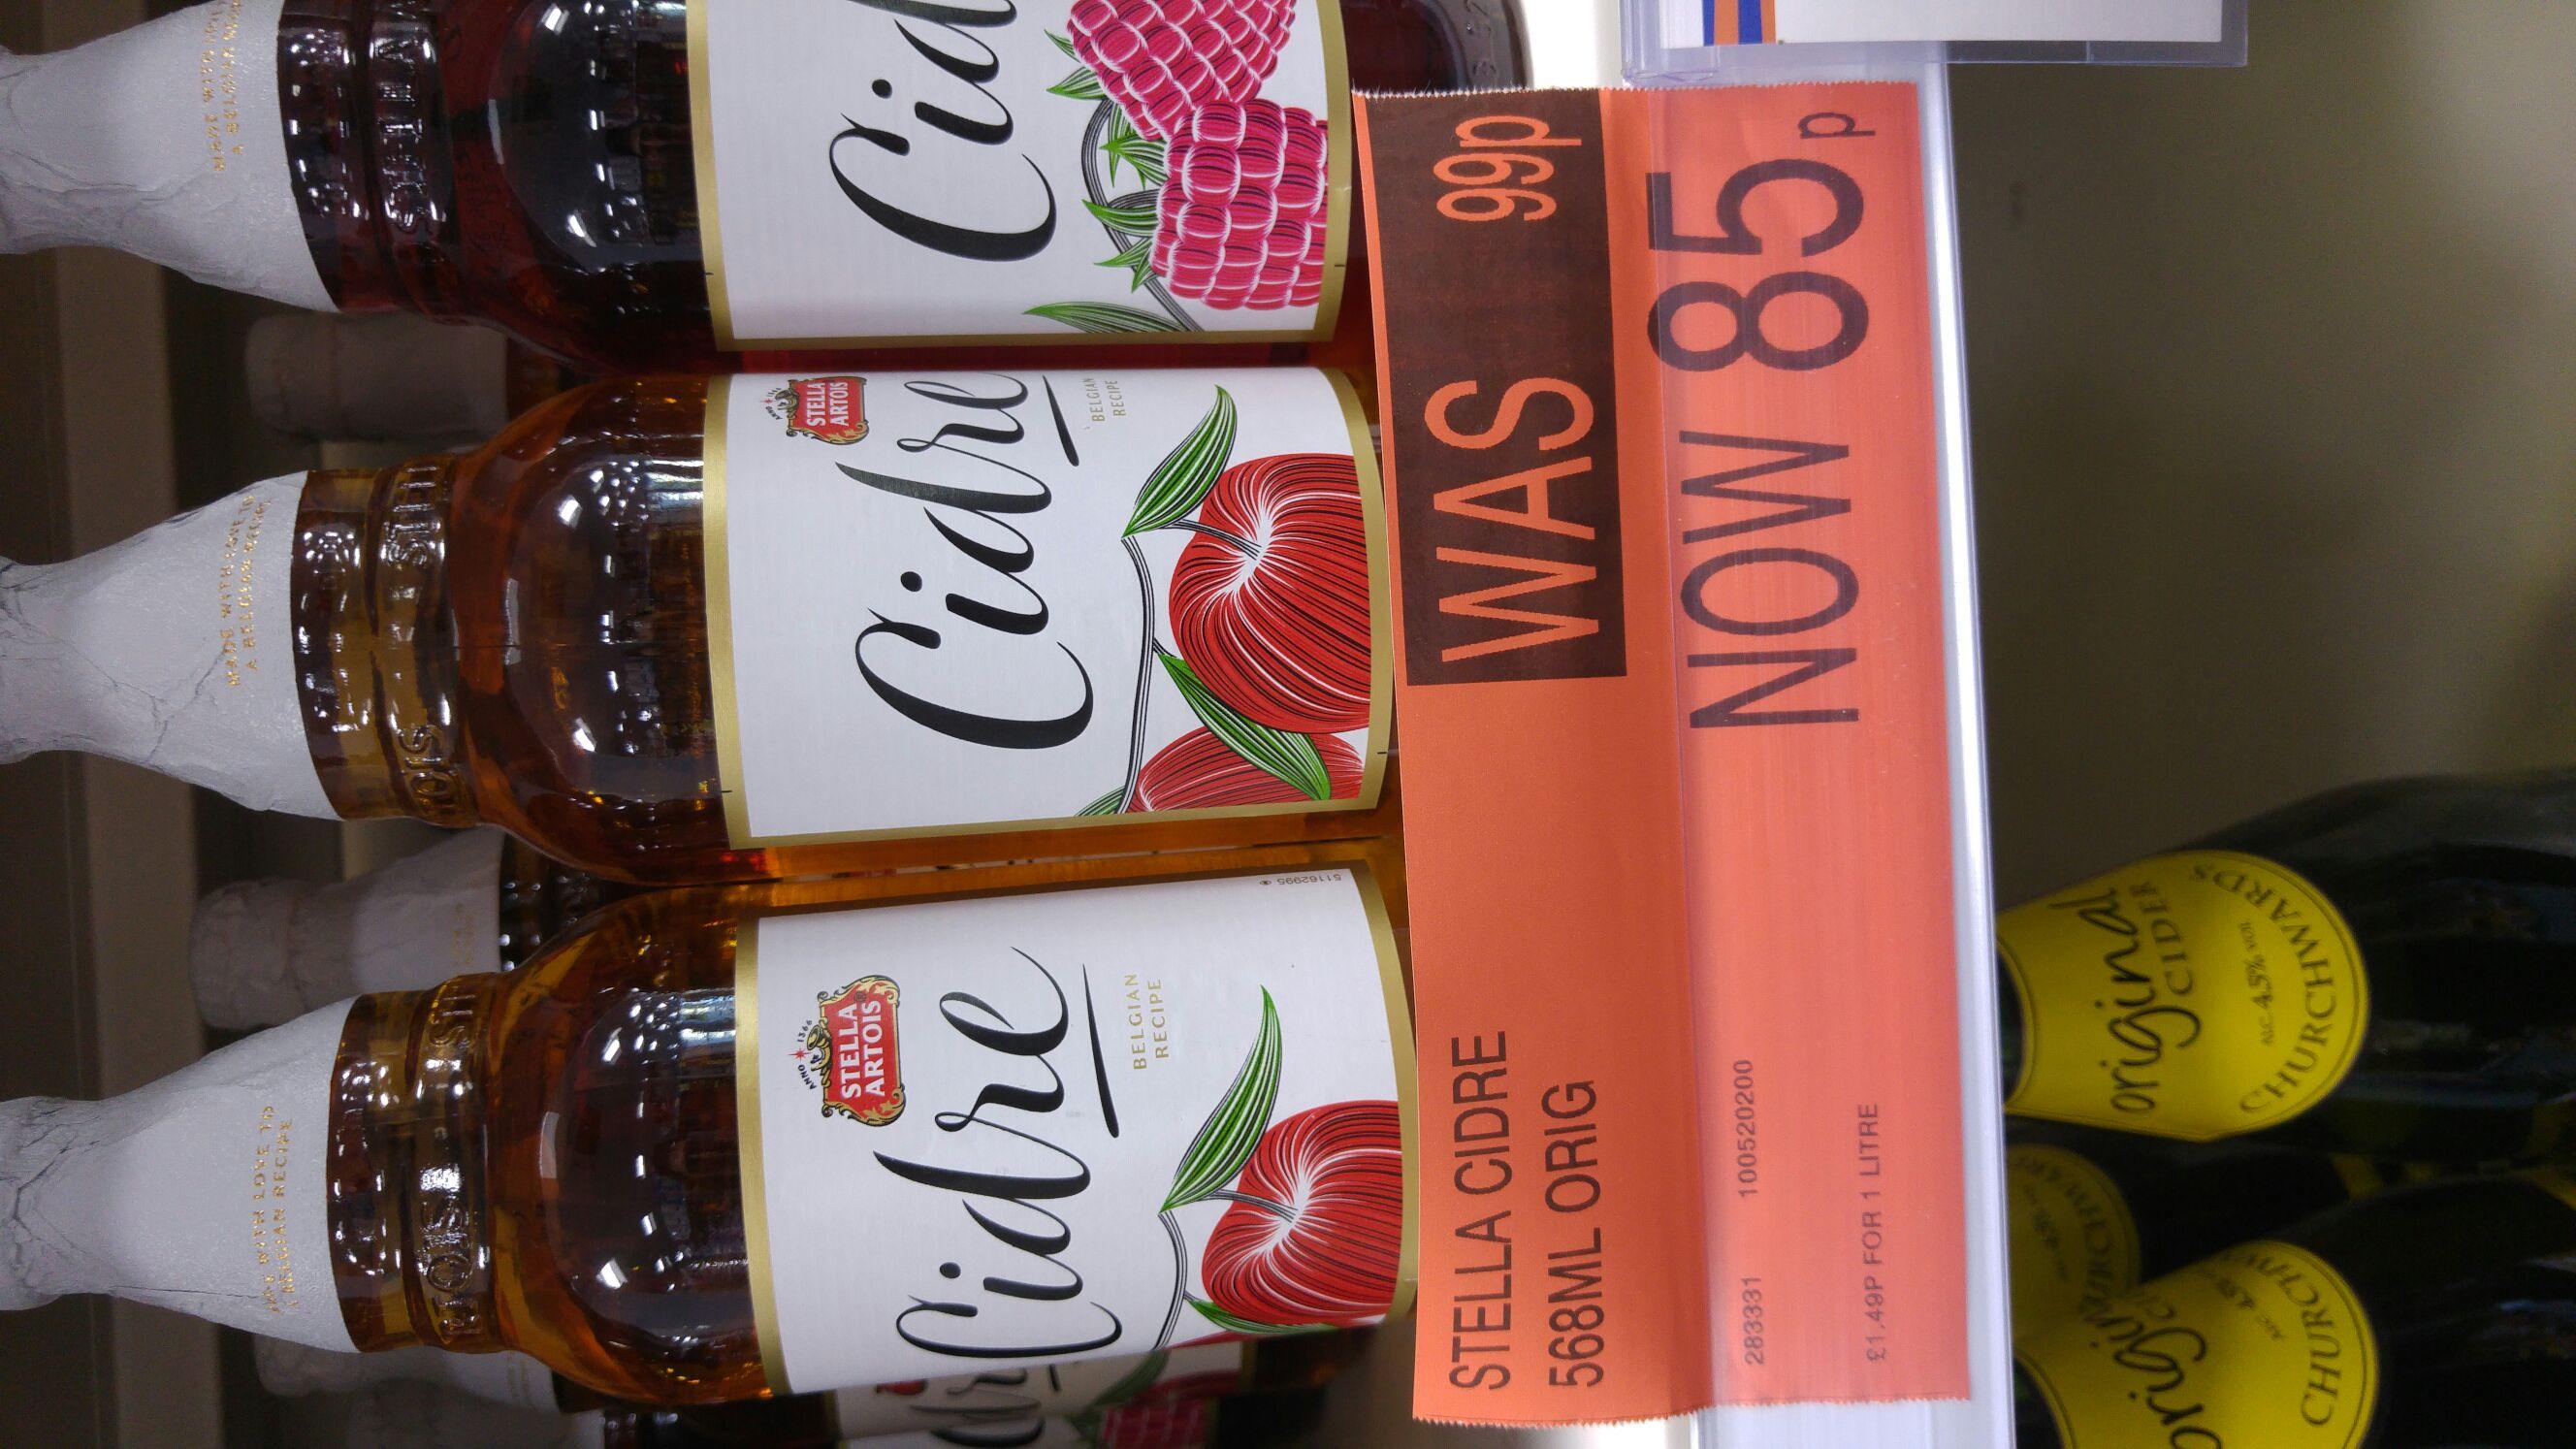 Stella Artois original cider 568ml - 85p - b&m Tolworth